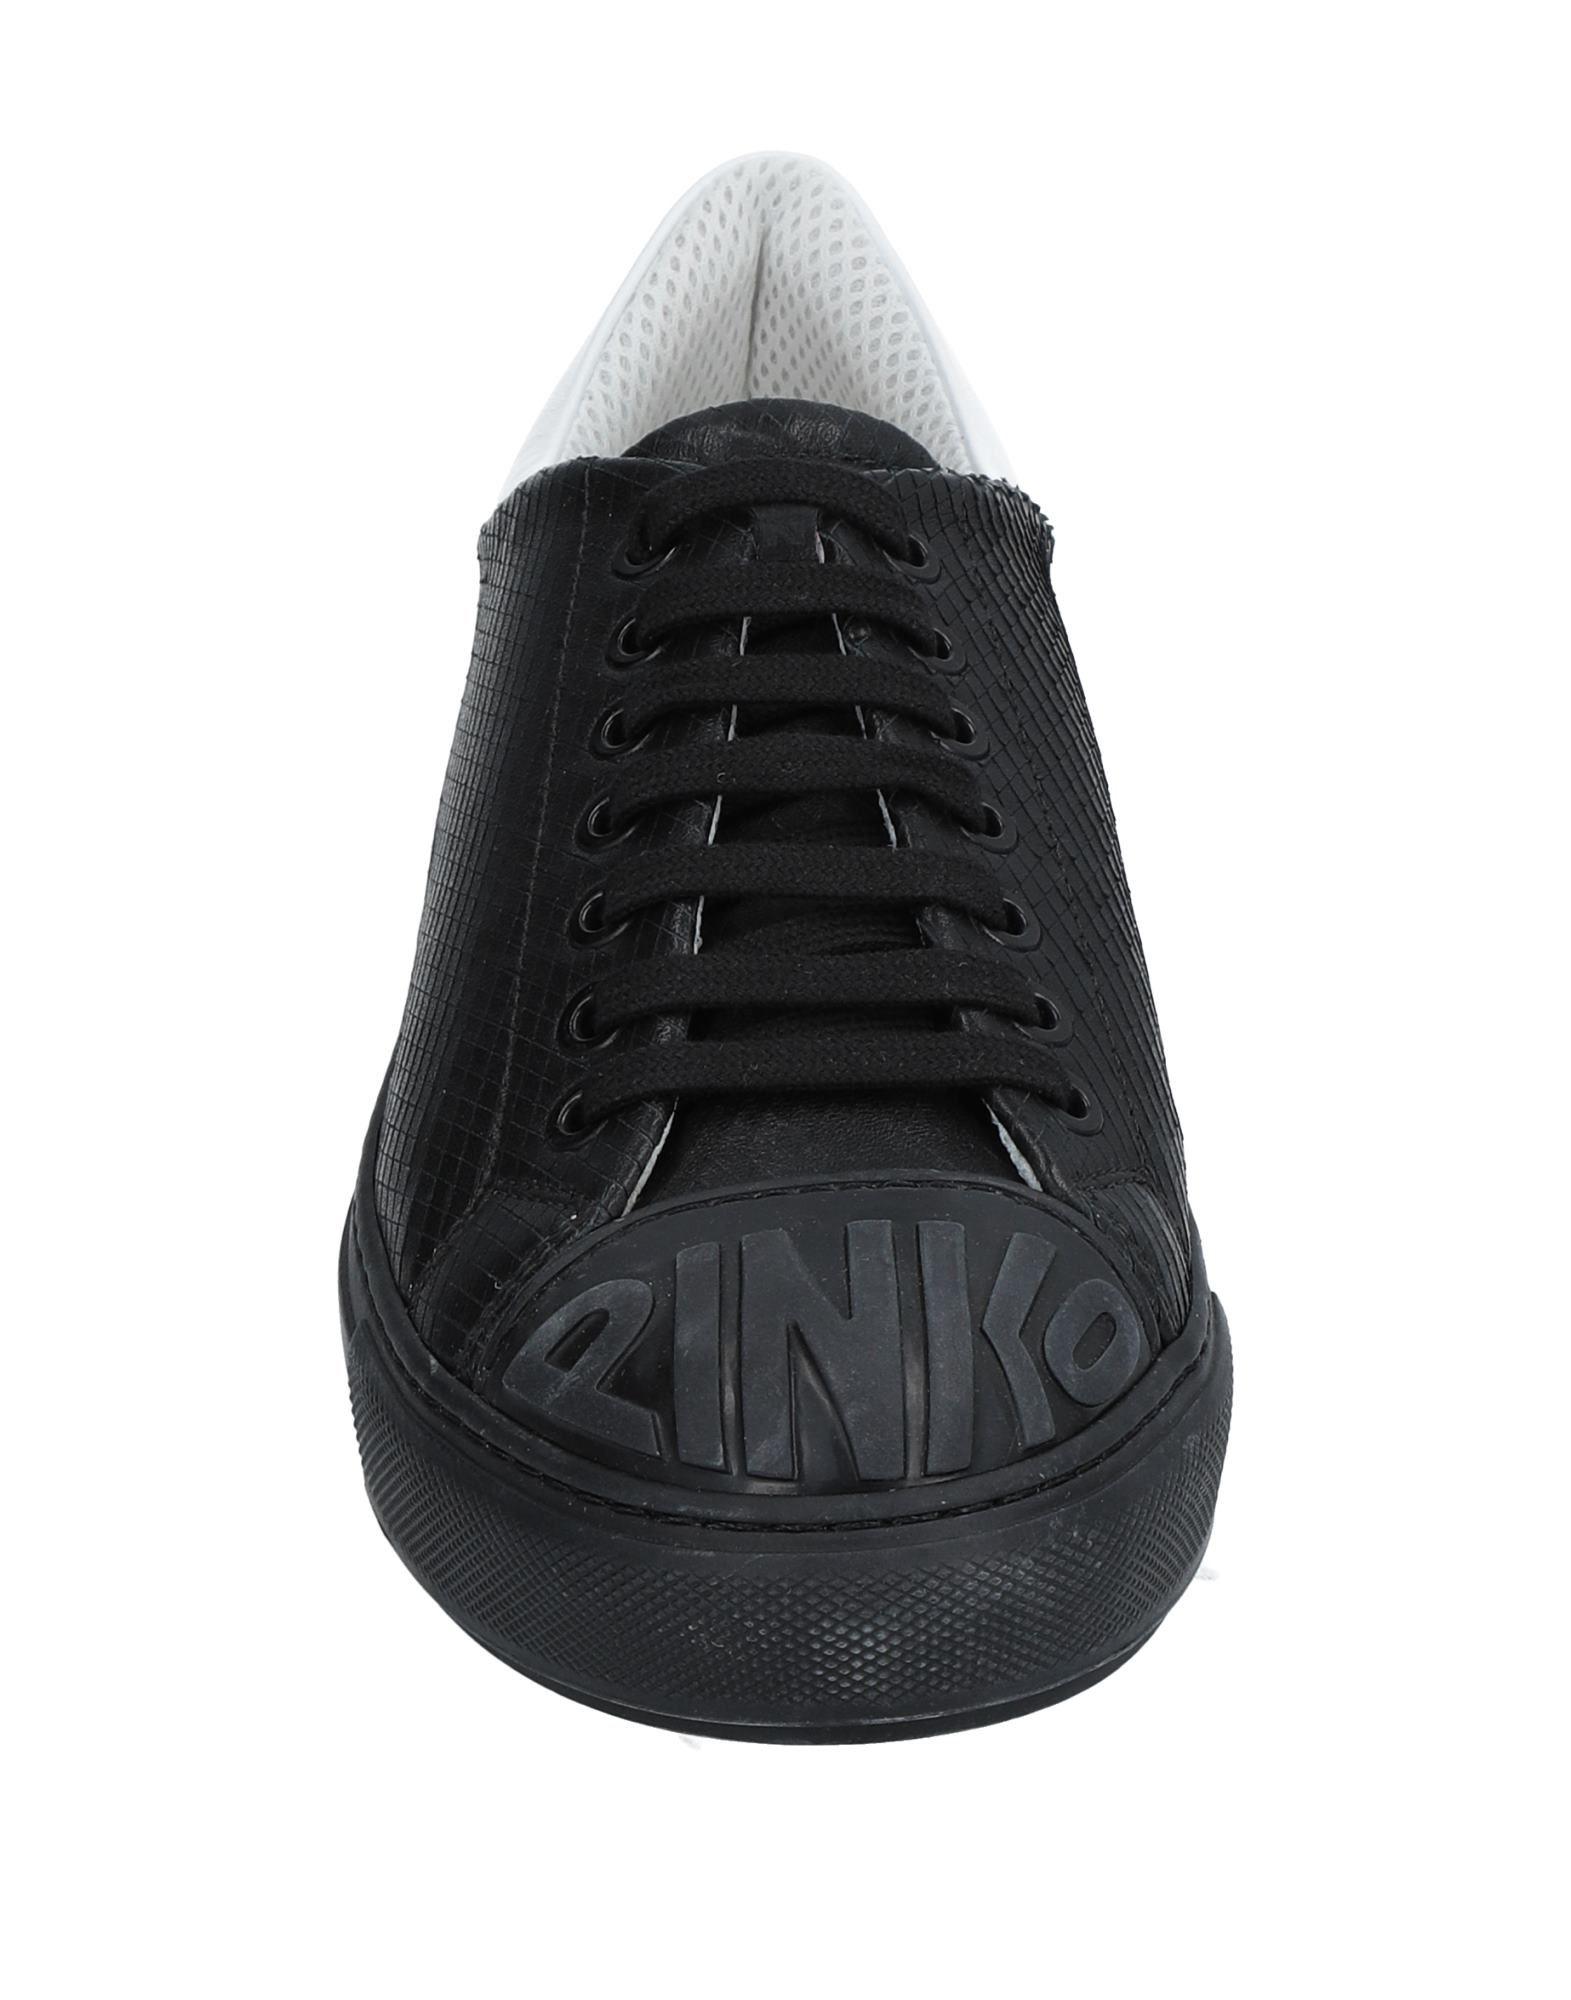 Pinko 11533701WE Sneakers Damen  11533701WE Pinko Gute Qualität beliebte Schuhe 4f864c